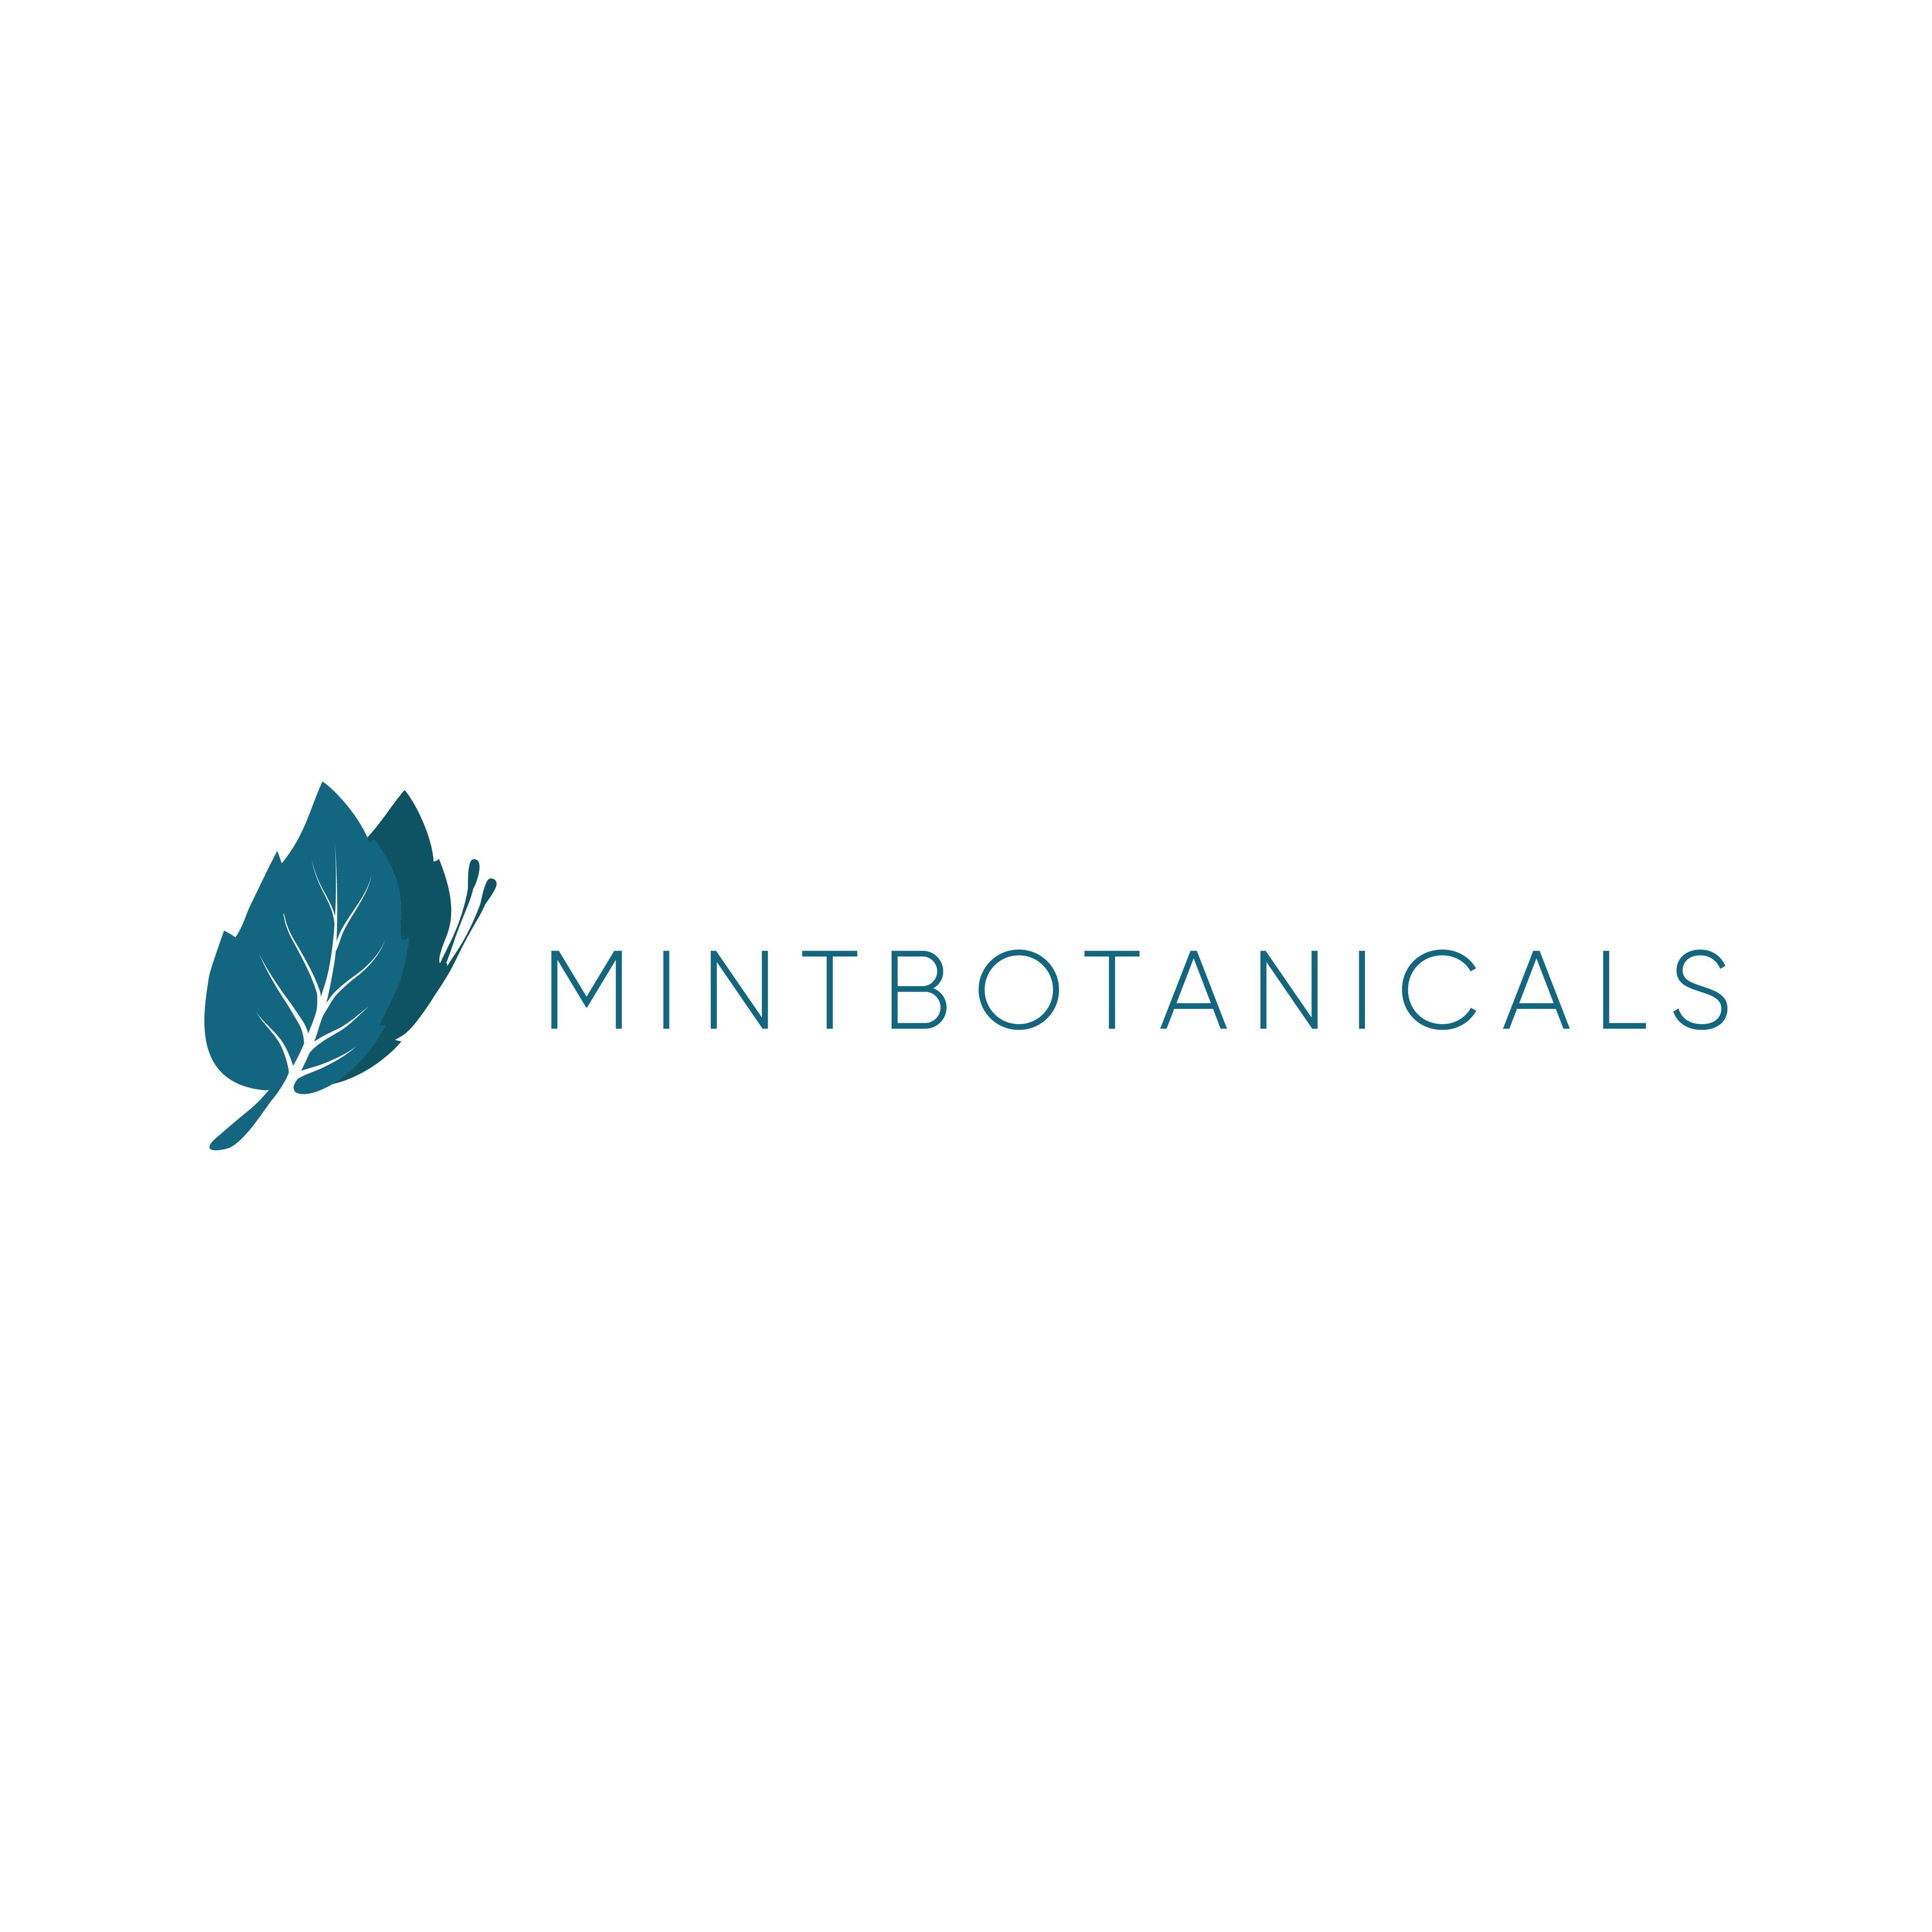 Logo needed for CBD health & beauty business